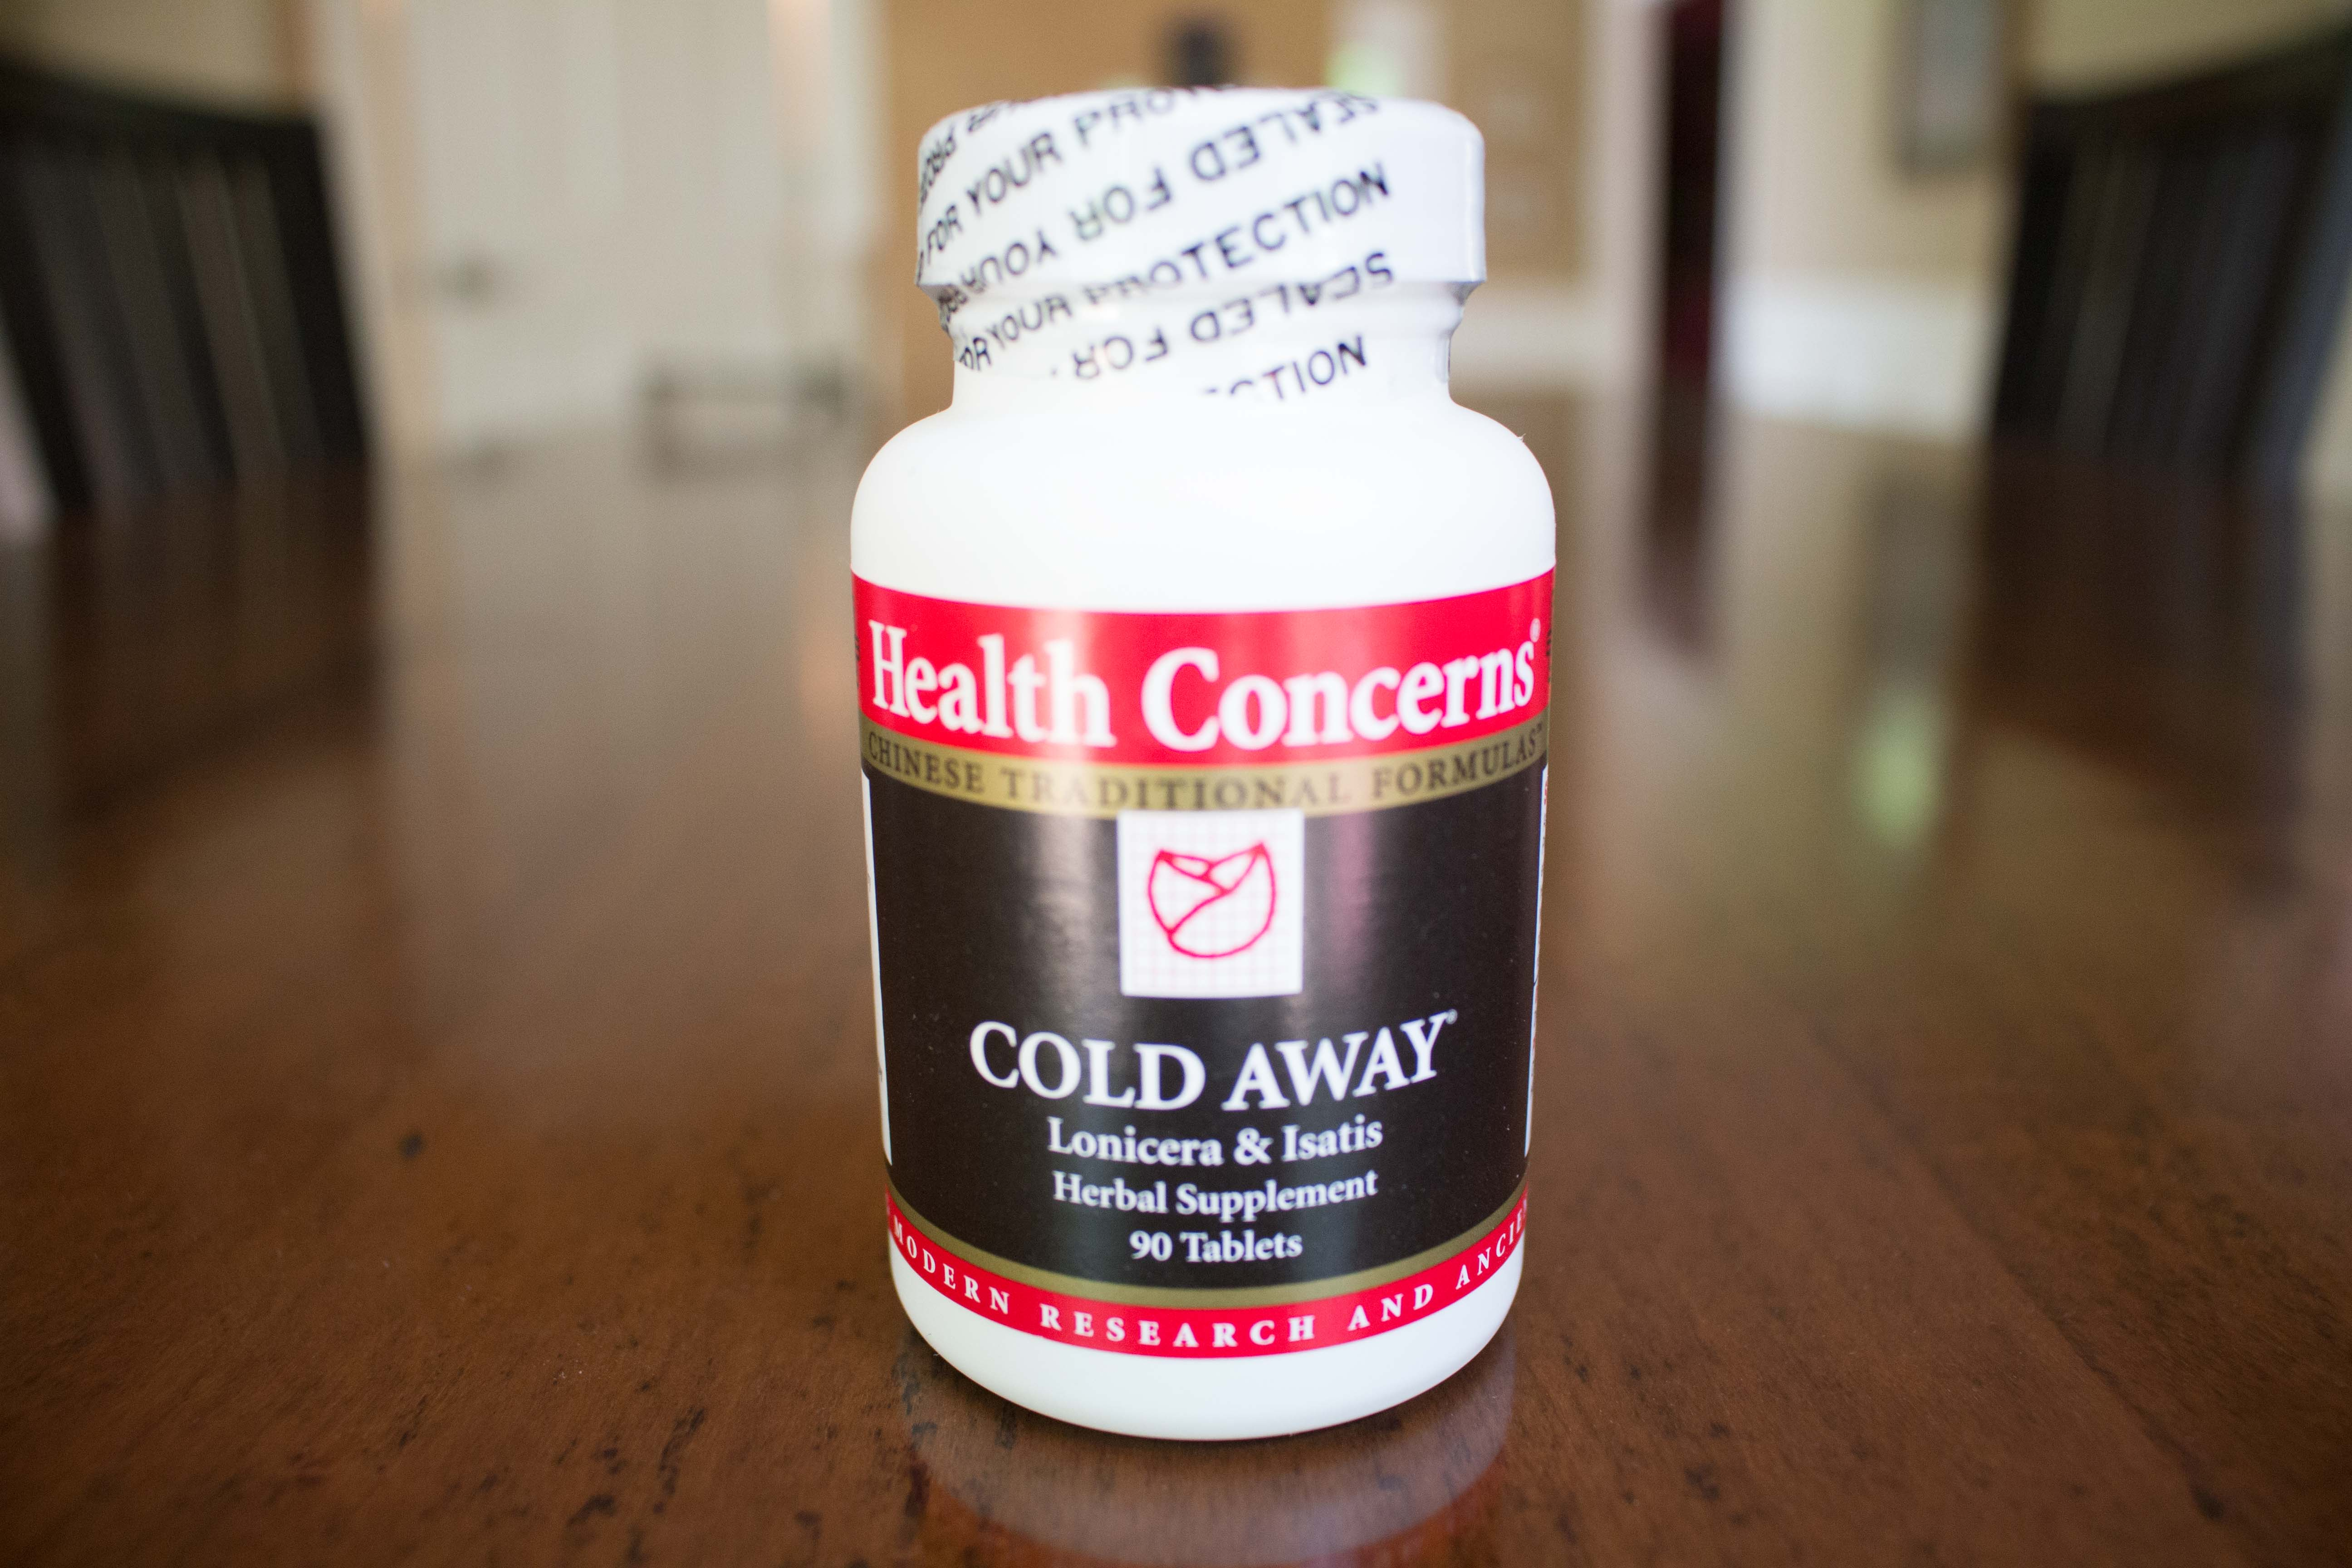 health concerns cold away